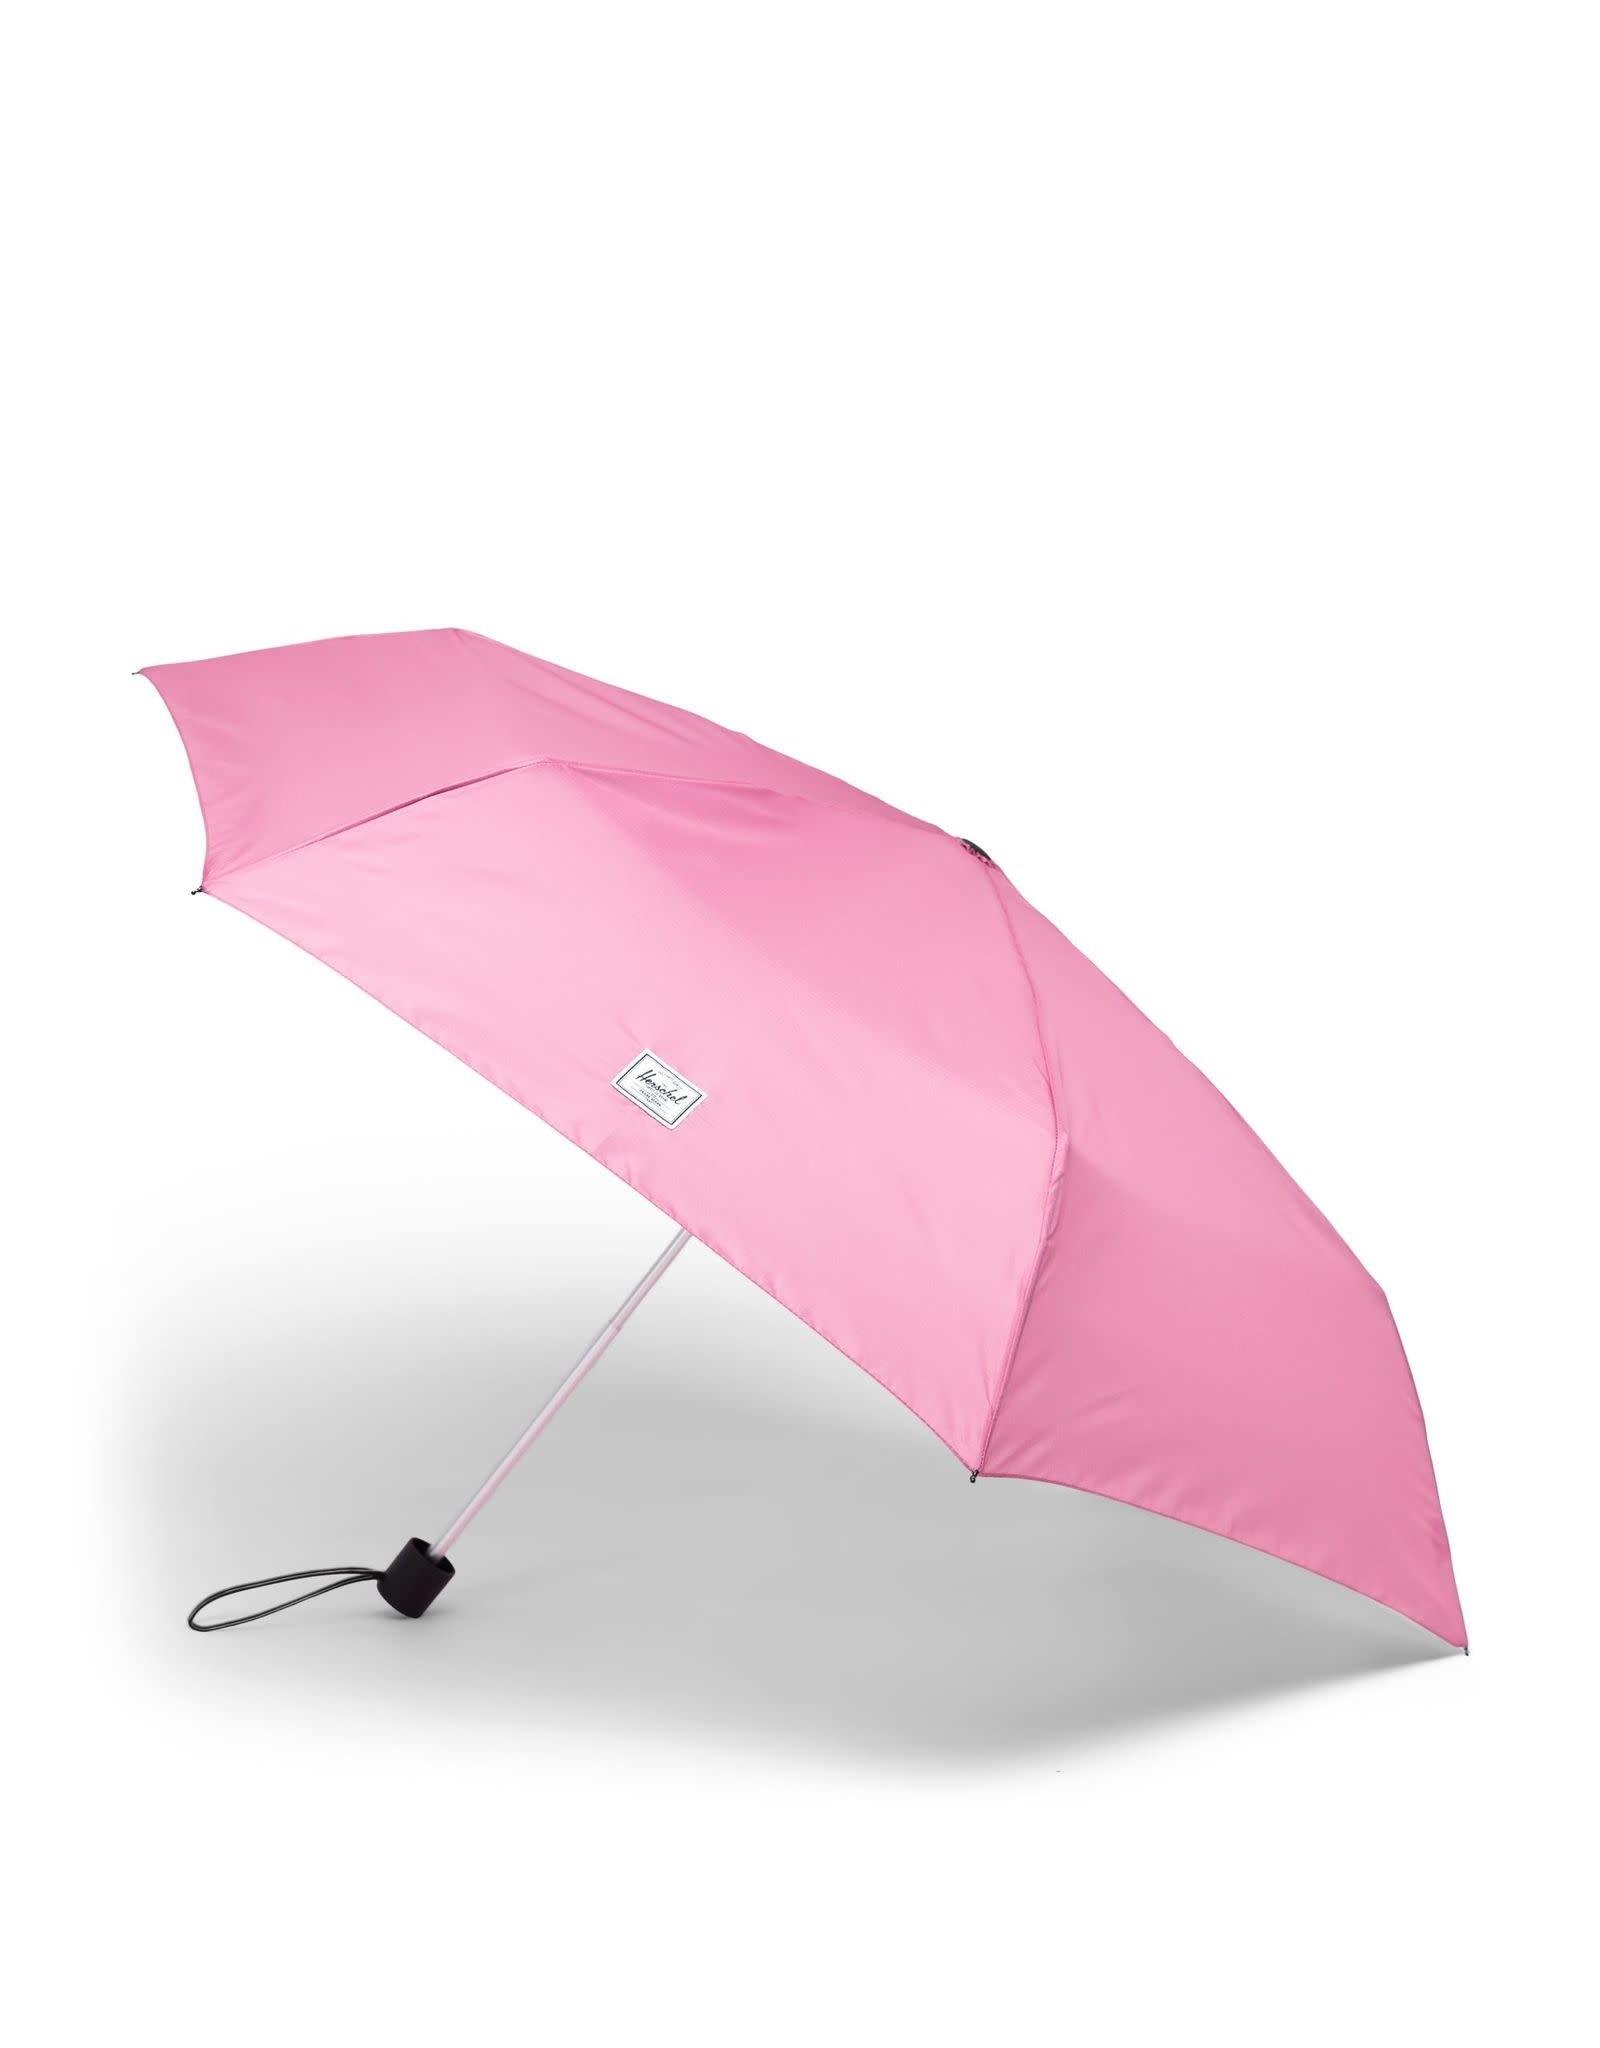 herschel Herschel - parapluie compact heather rose/ blue mirage